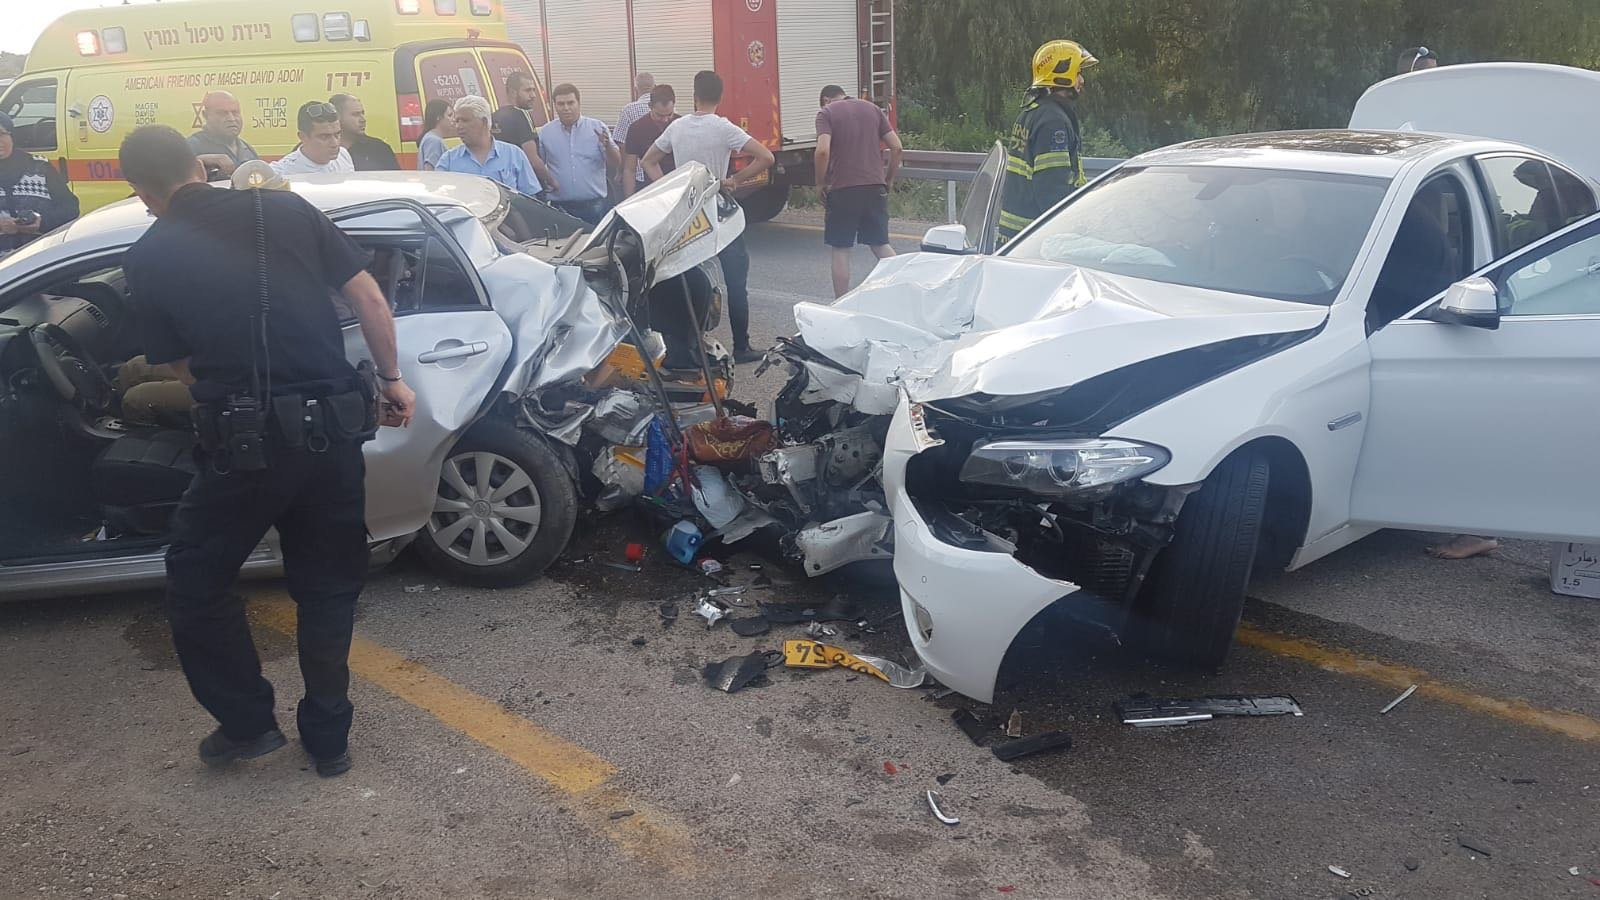 كفر مصر: حادث طرق و3 اصابات متوسطة